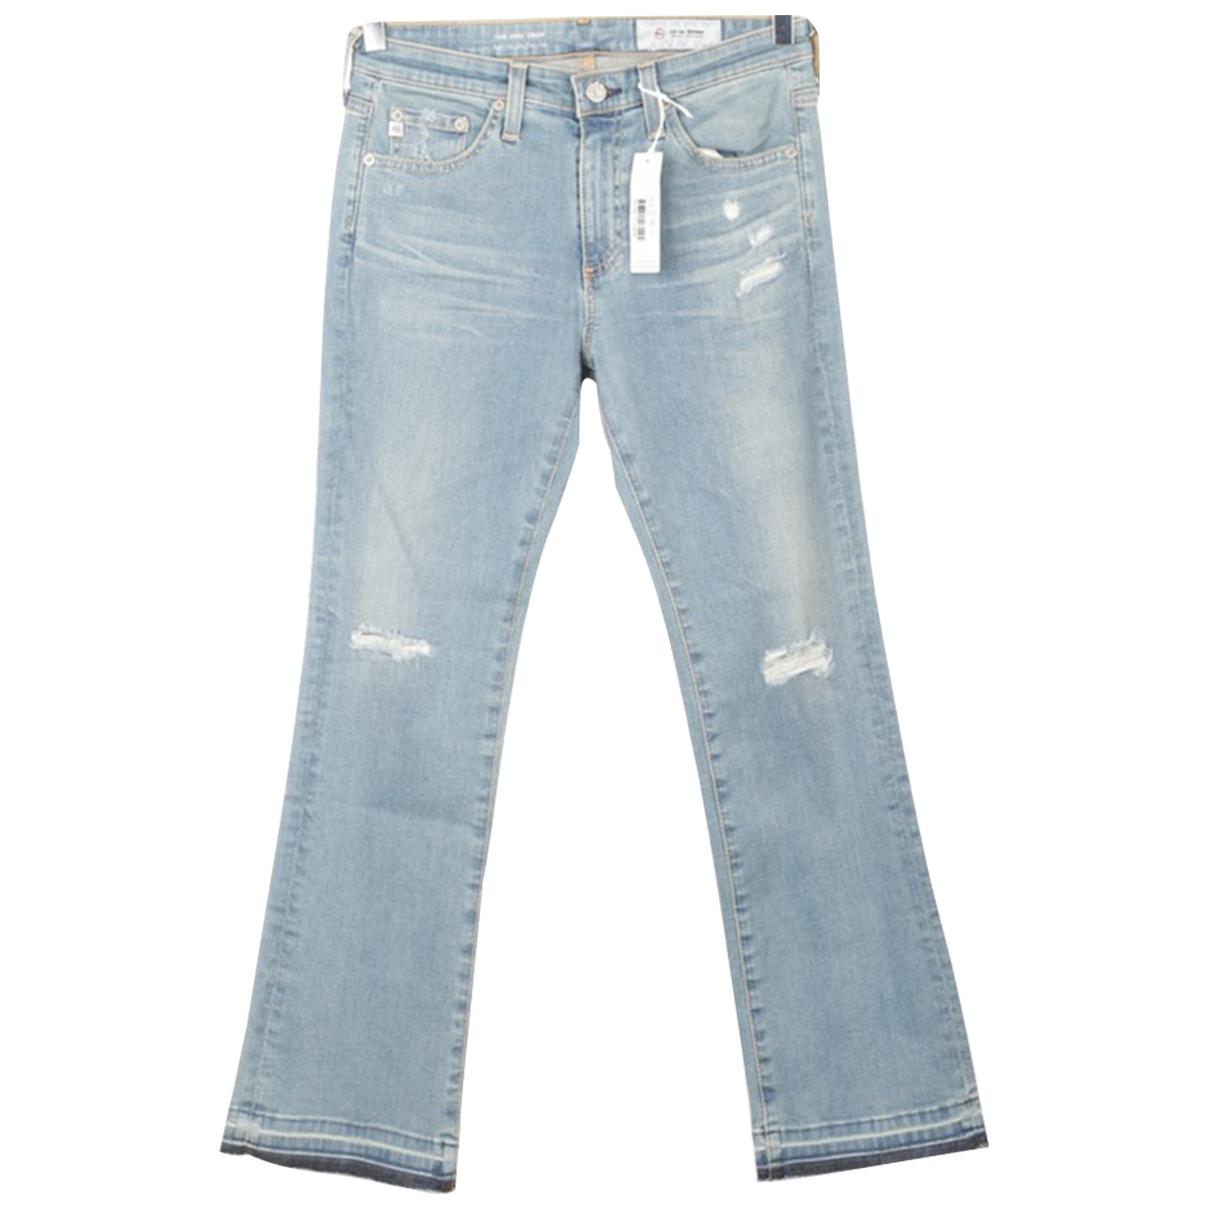 Vaquero Ag Jeans